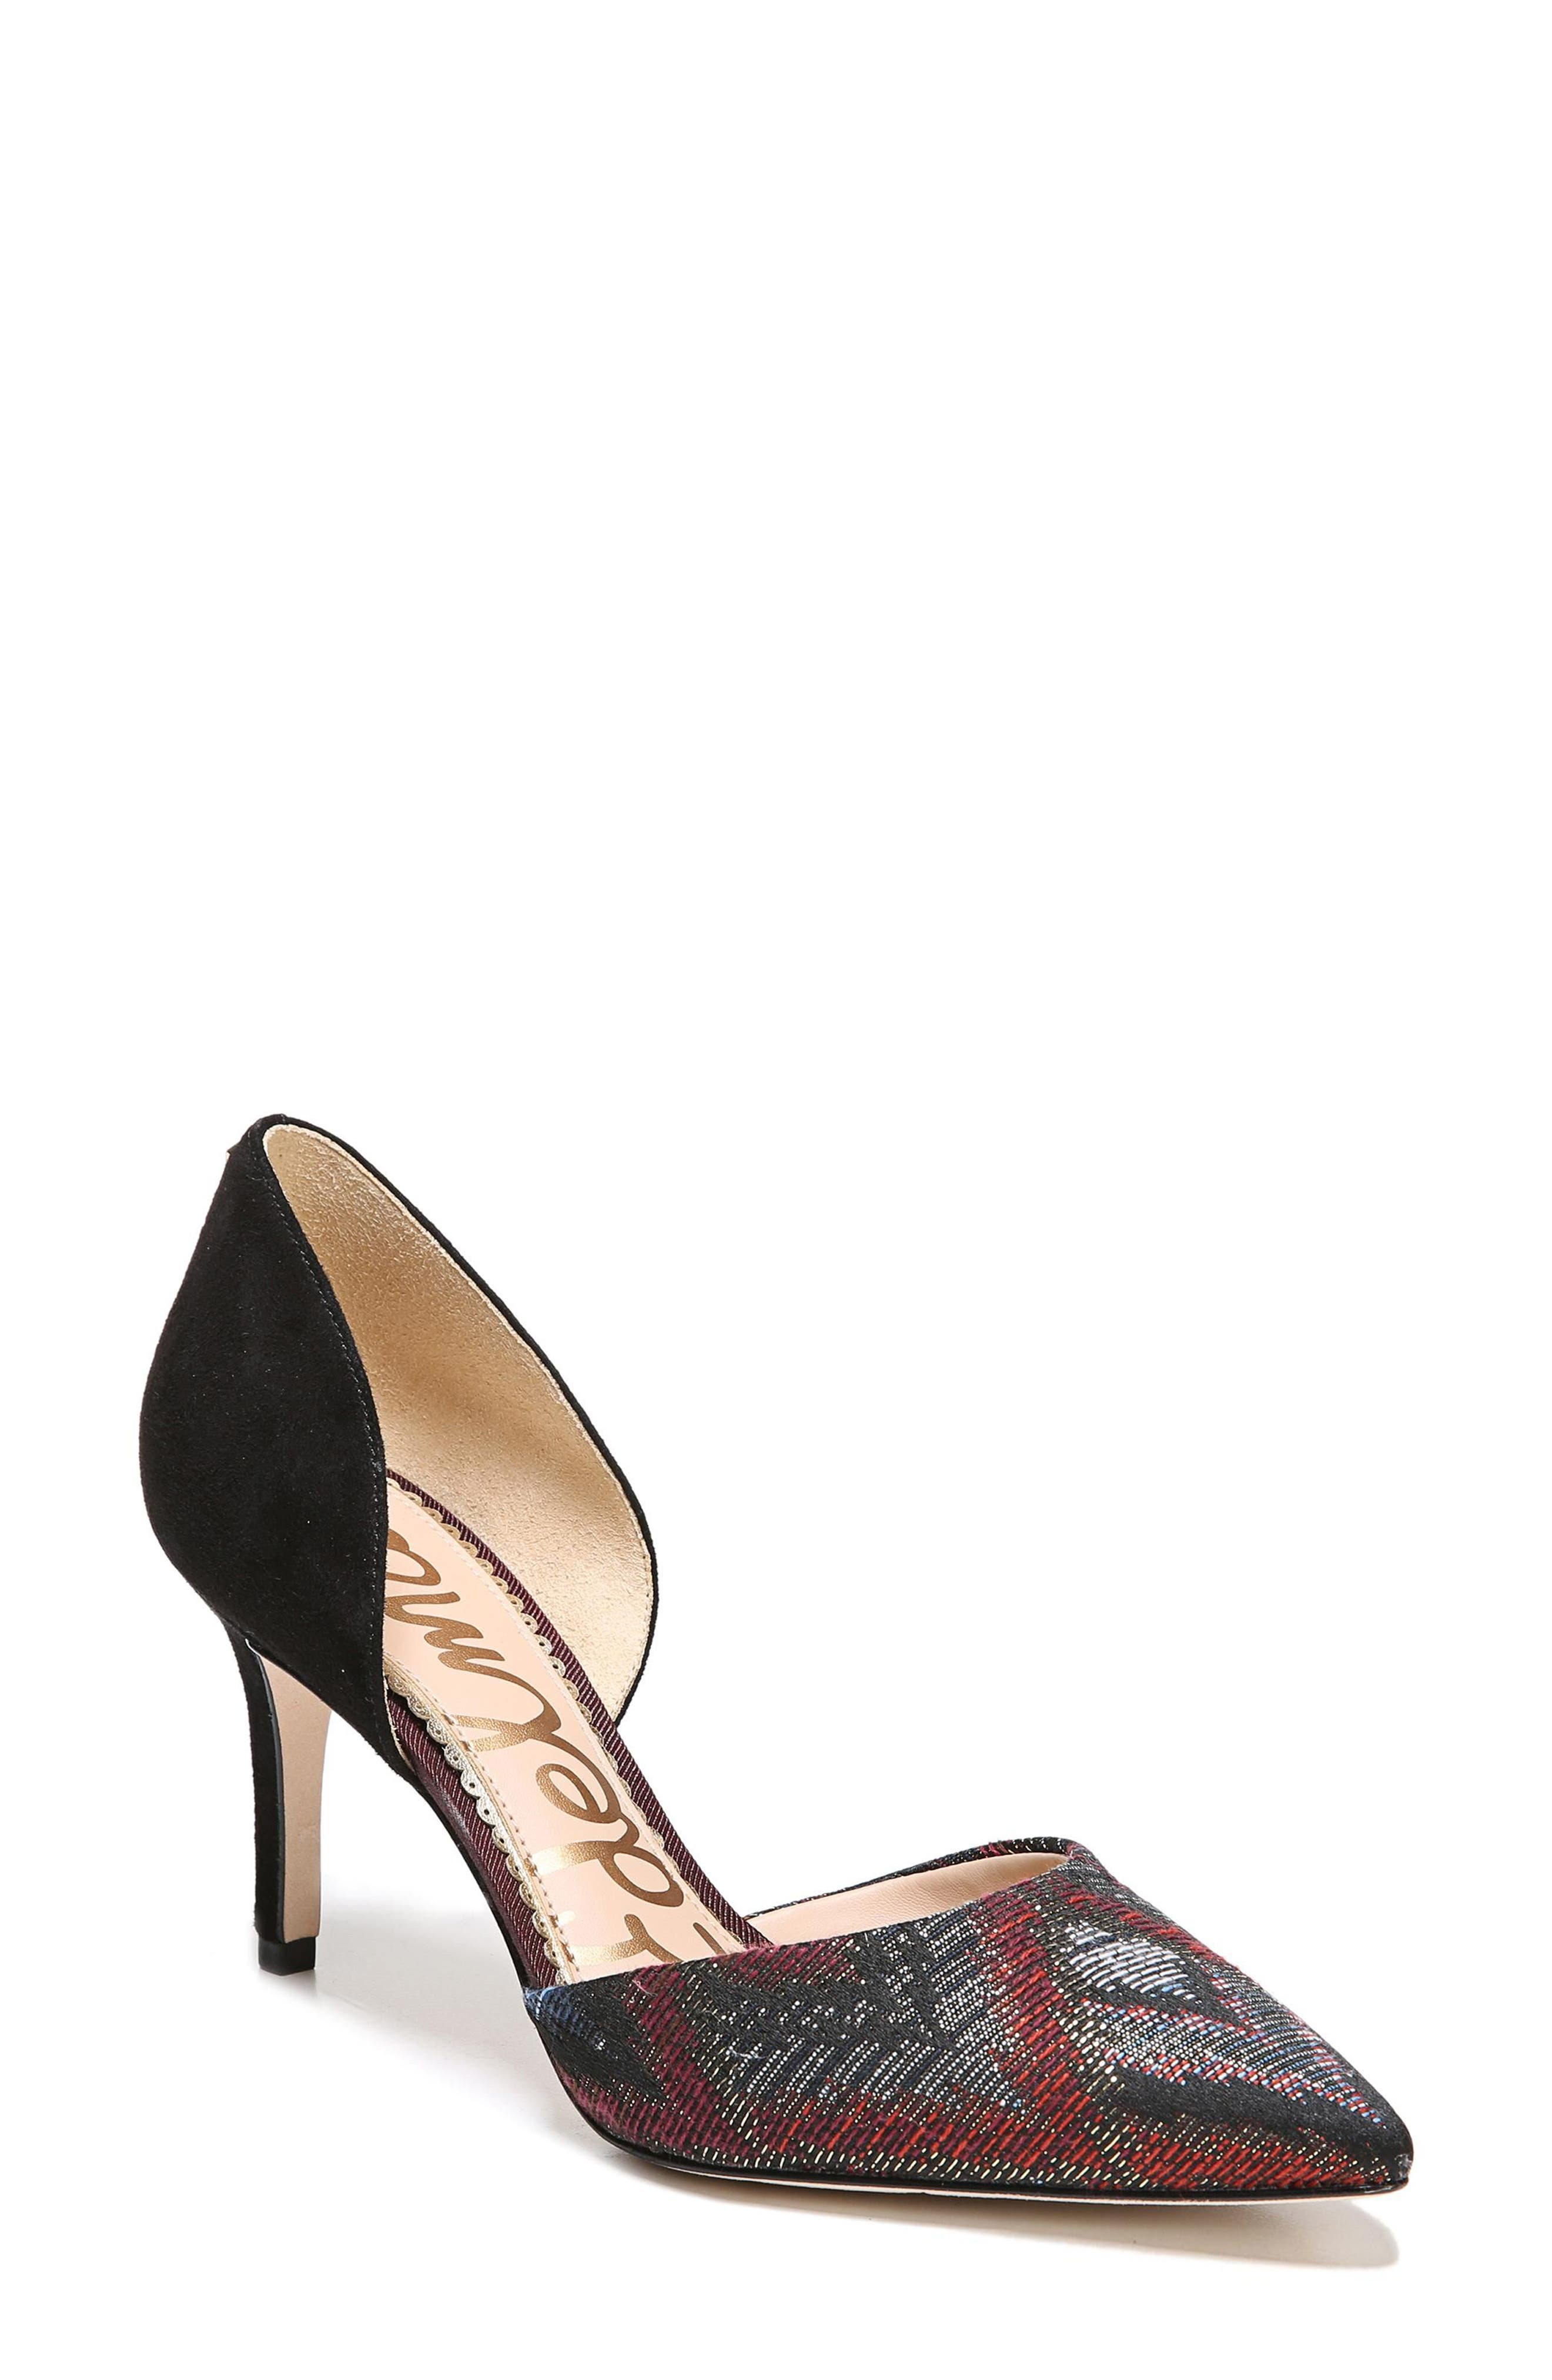 Main Image - Sam Edelman 'Telsa' d'Orsay Pointy Toe Pump (Women)